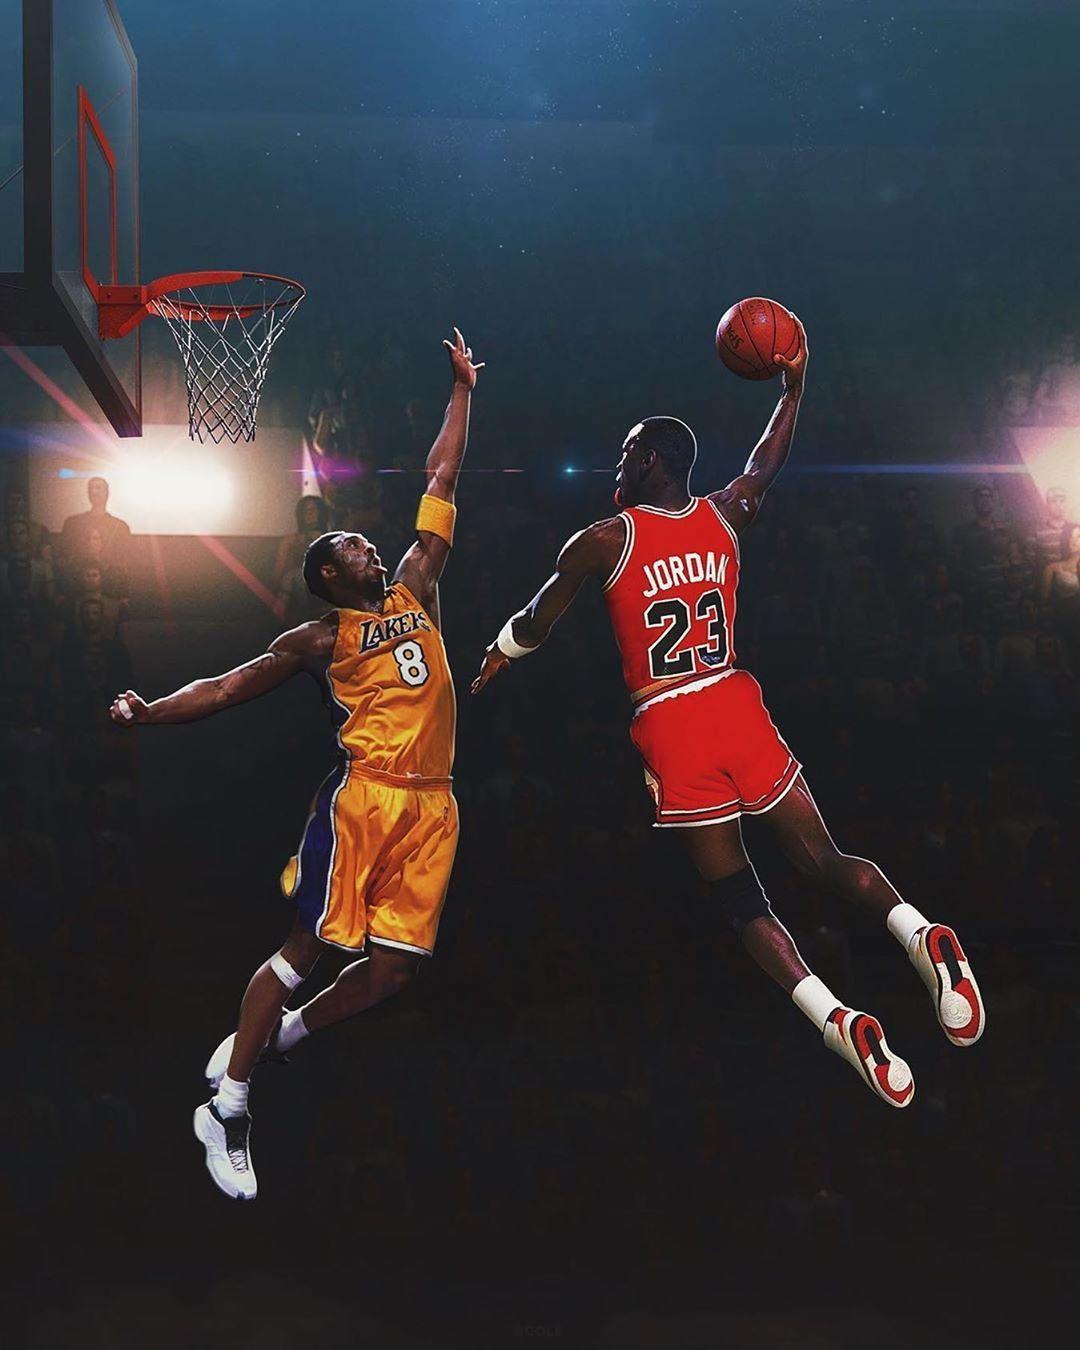 Michael jordan basketball, Kobe bryant